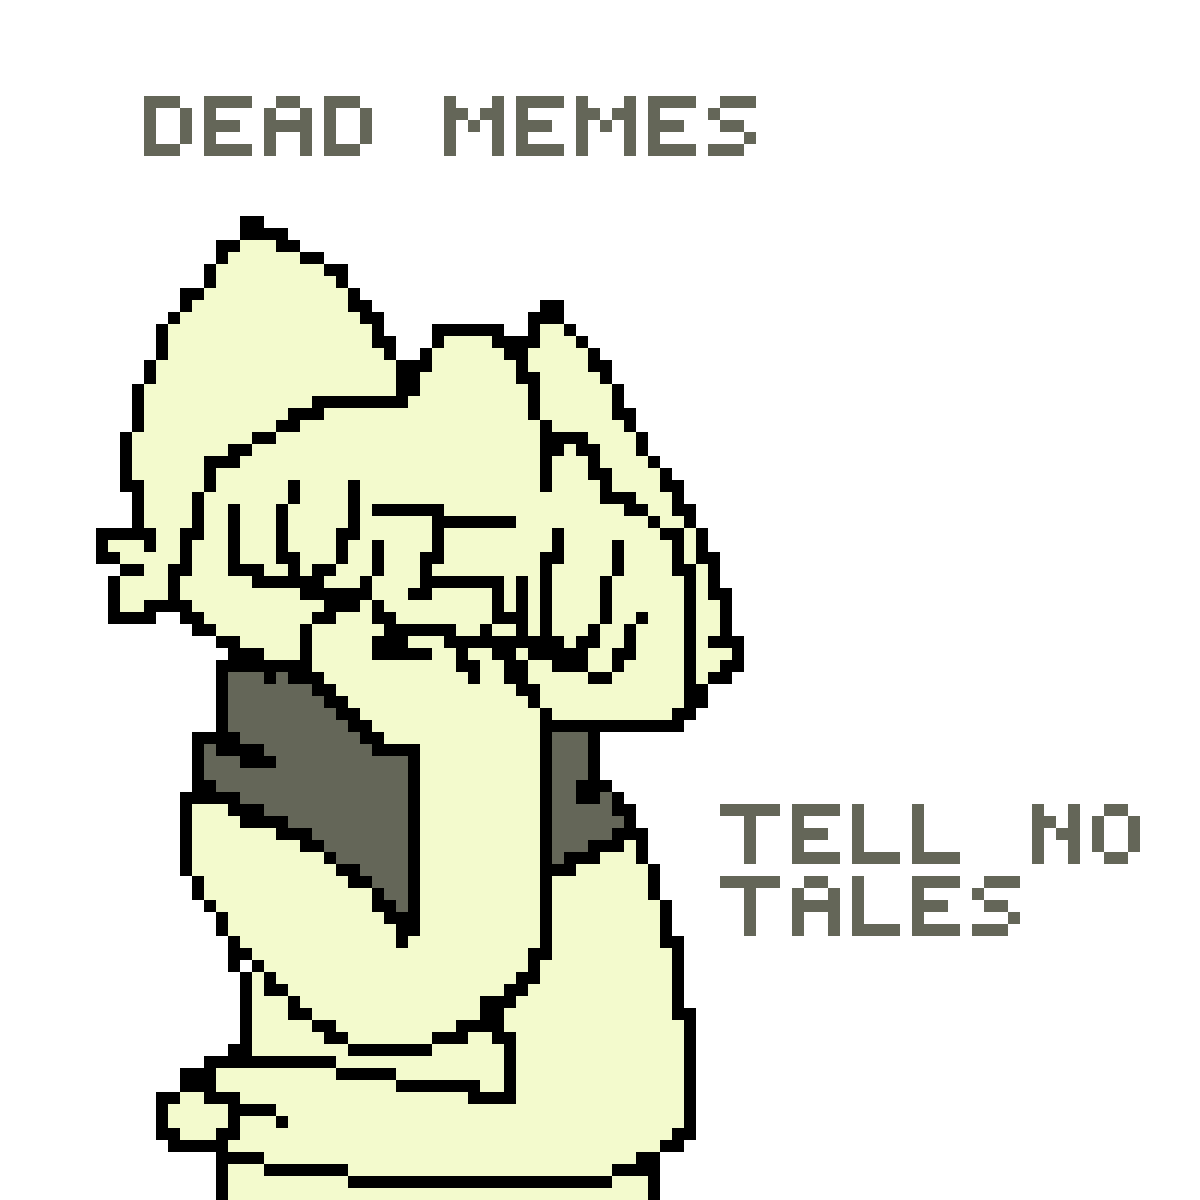 dead memes tell no tales